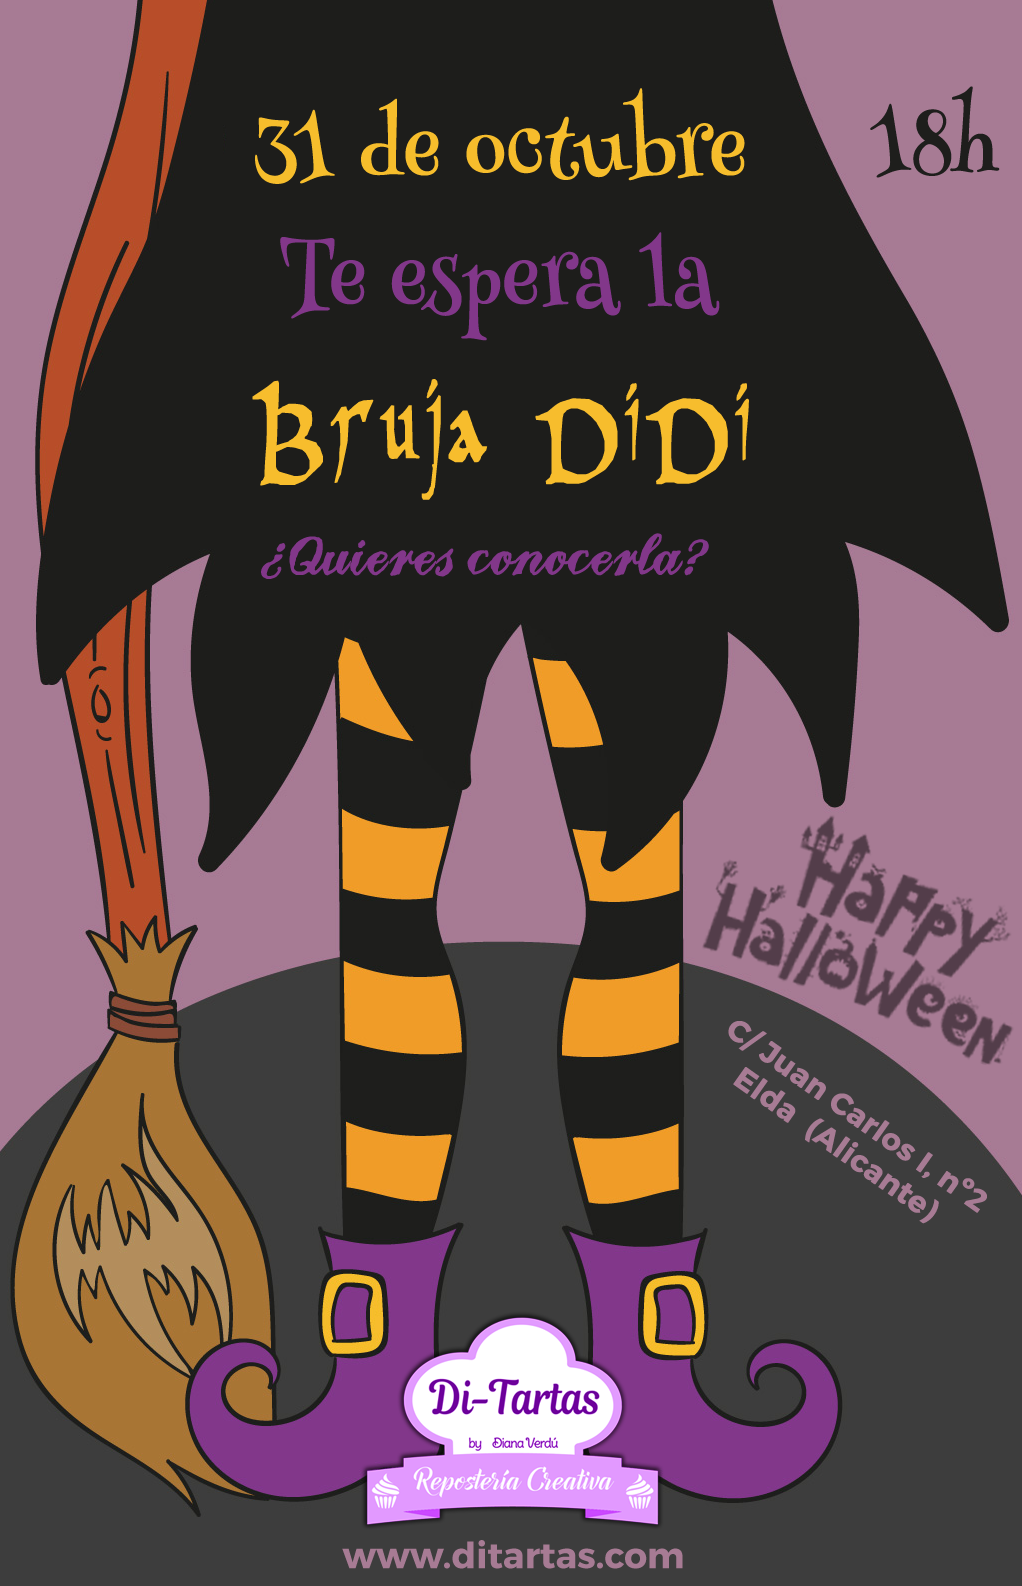 bruja DiDi halloween ditartas